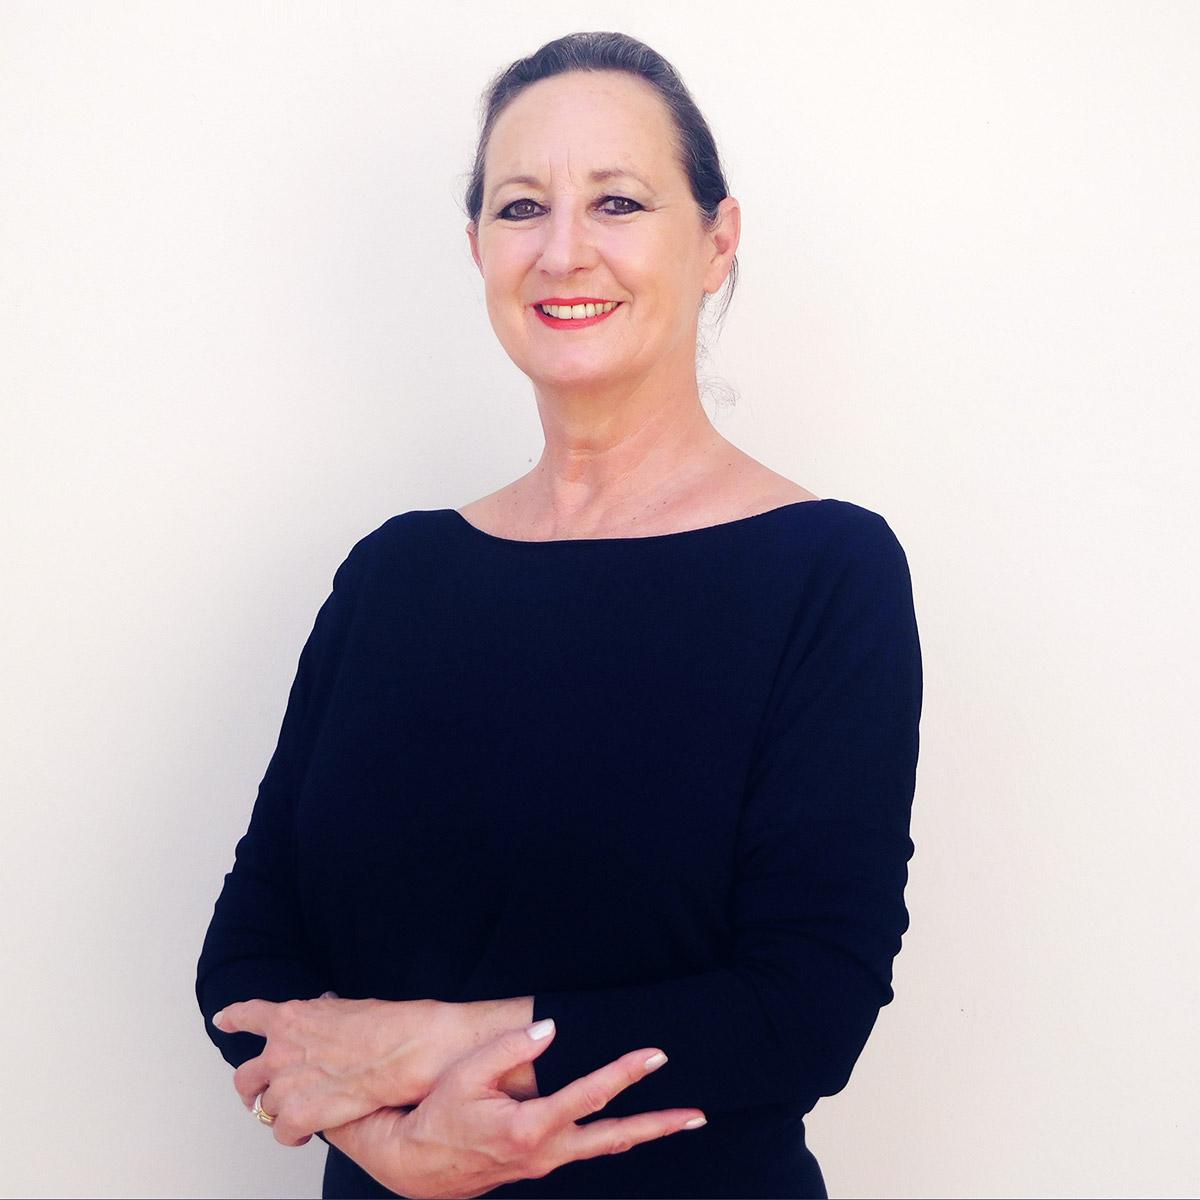 Astrid Huisman-Biemans